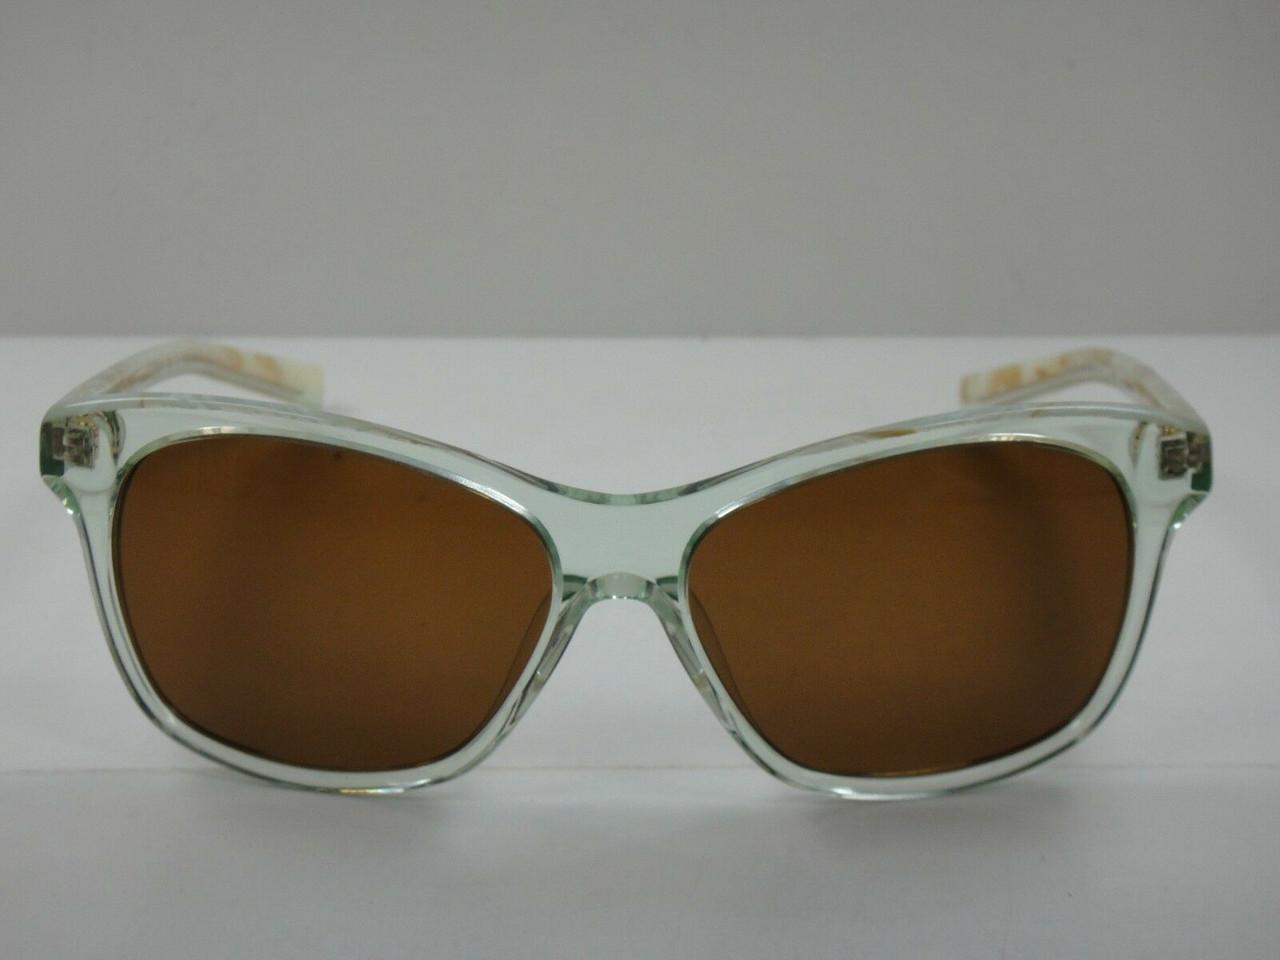 Costa Del Mar Sarasota Cat Eye Polarize Sunglass Seafoam Green/Copper 580G Glass